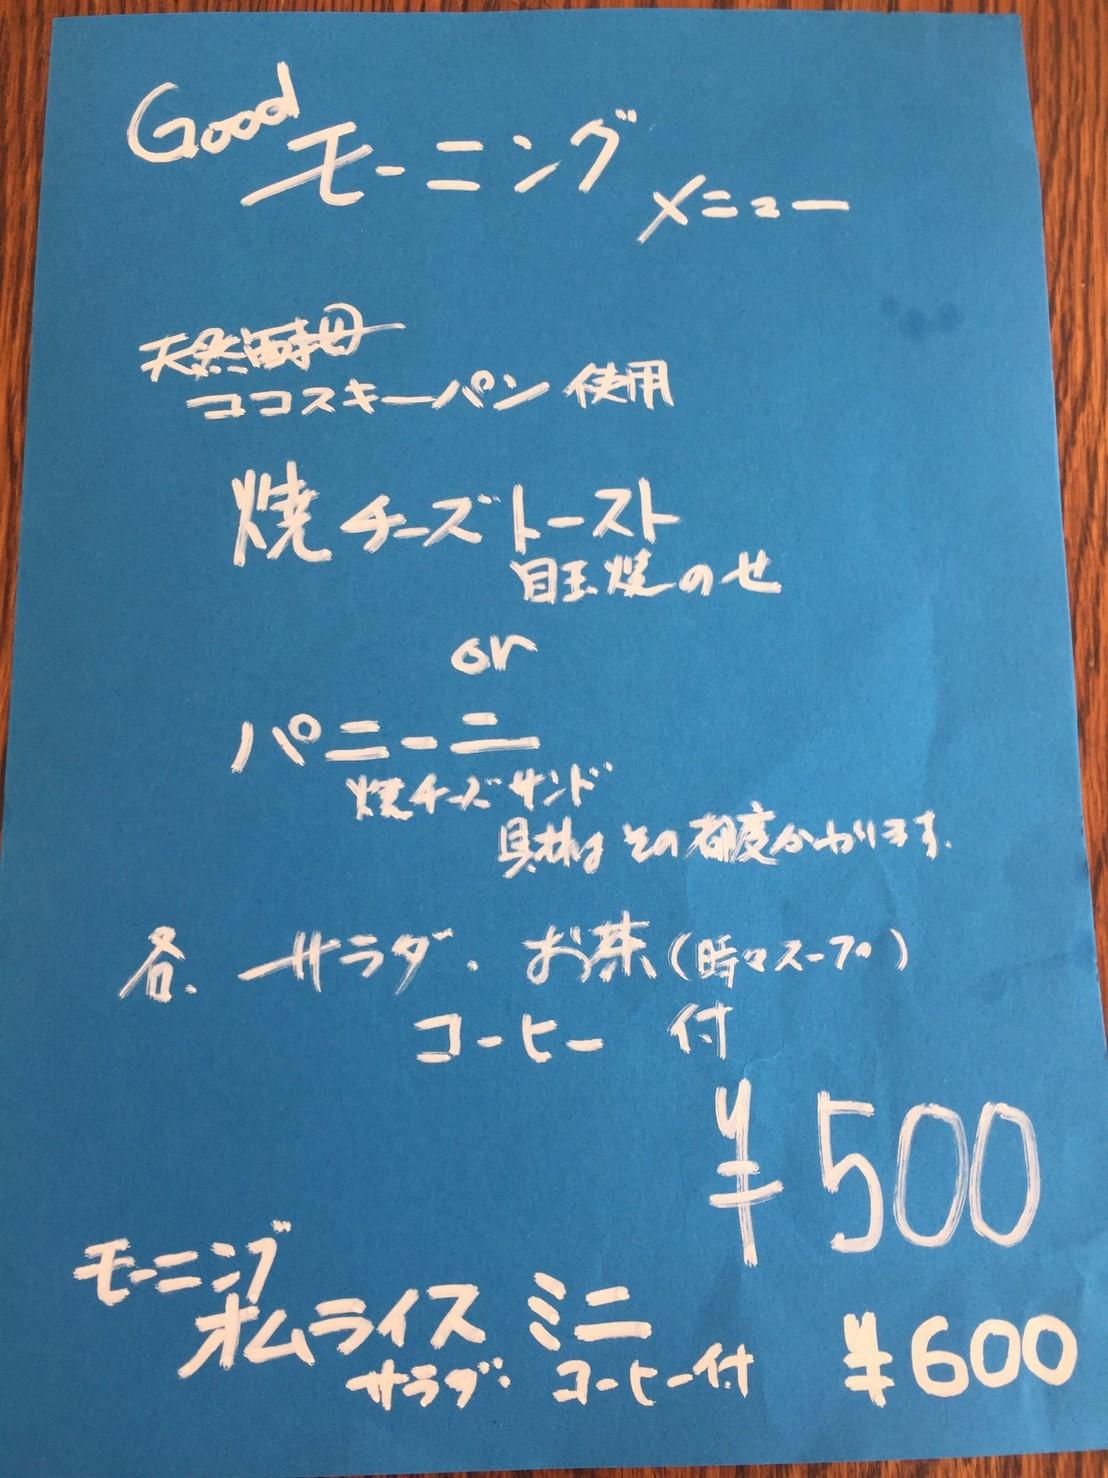 Tottori カルマ  カルマ焼飯_e0115904_22253808.jpg